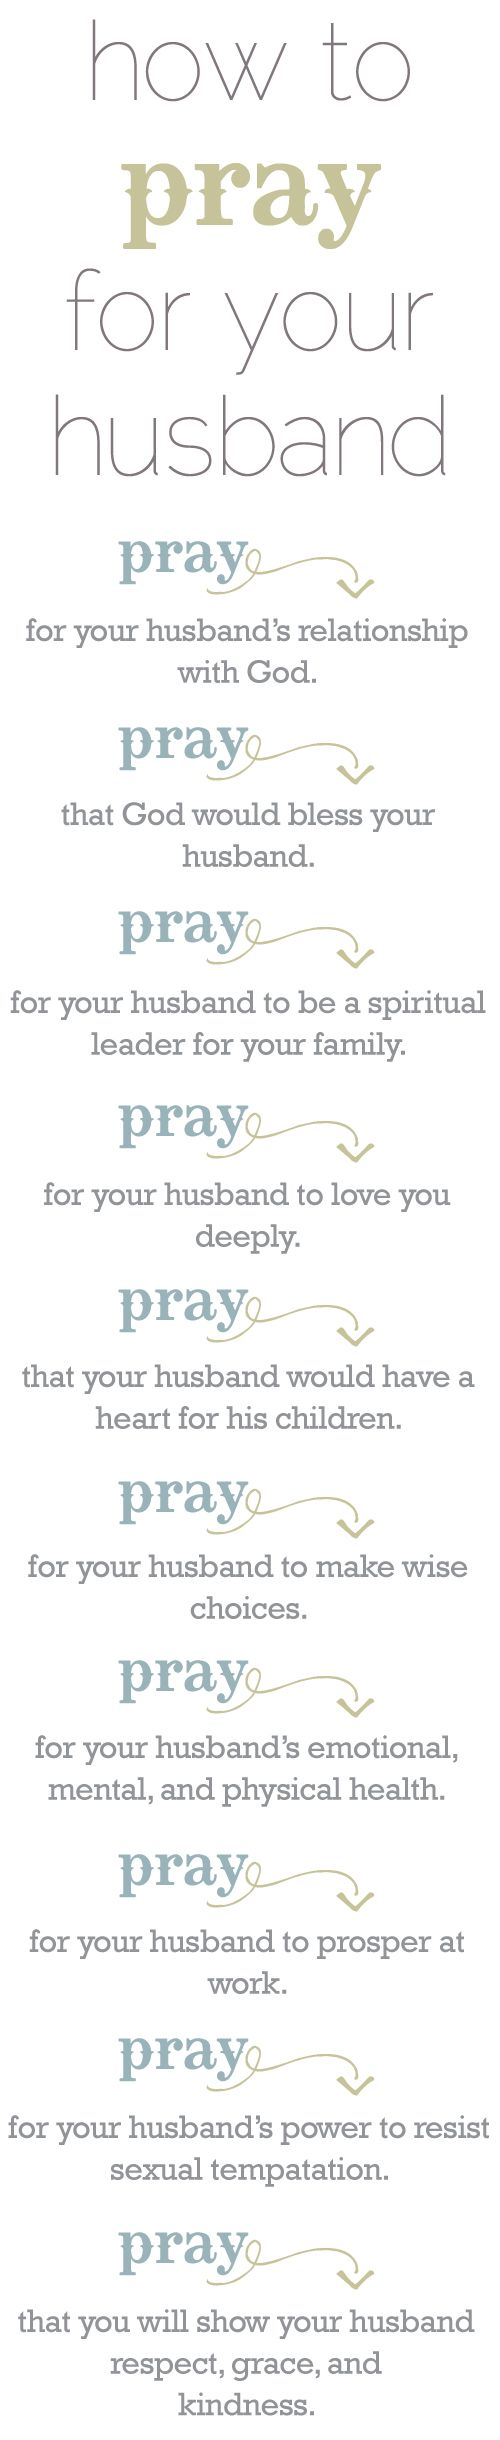 a nice reminder of everything husbands do!